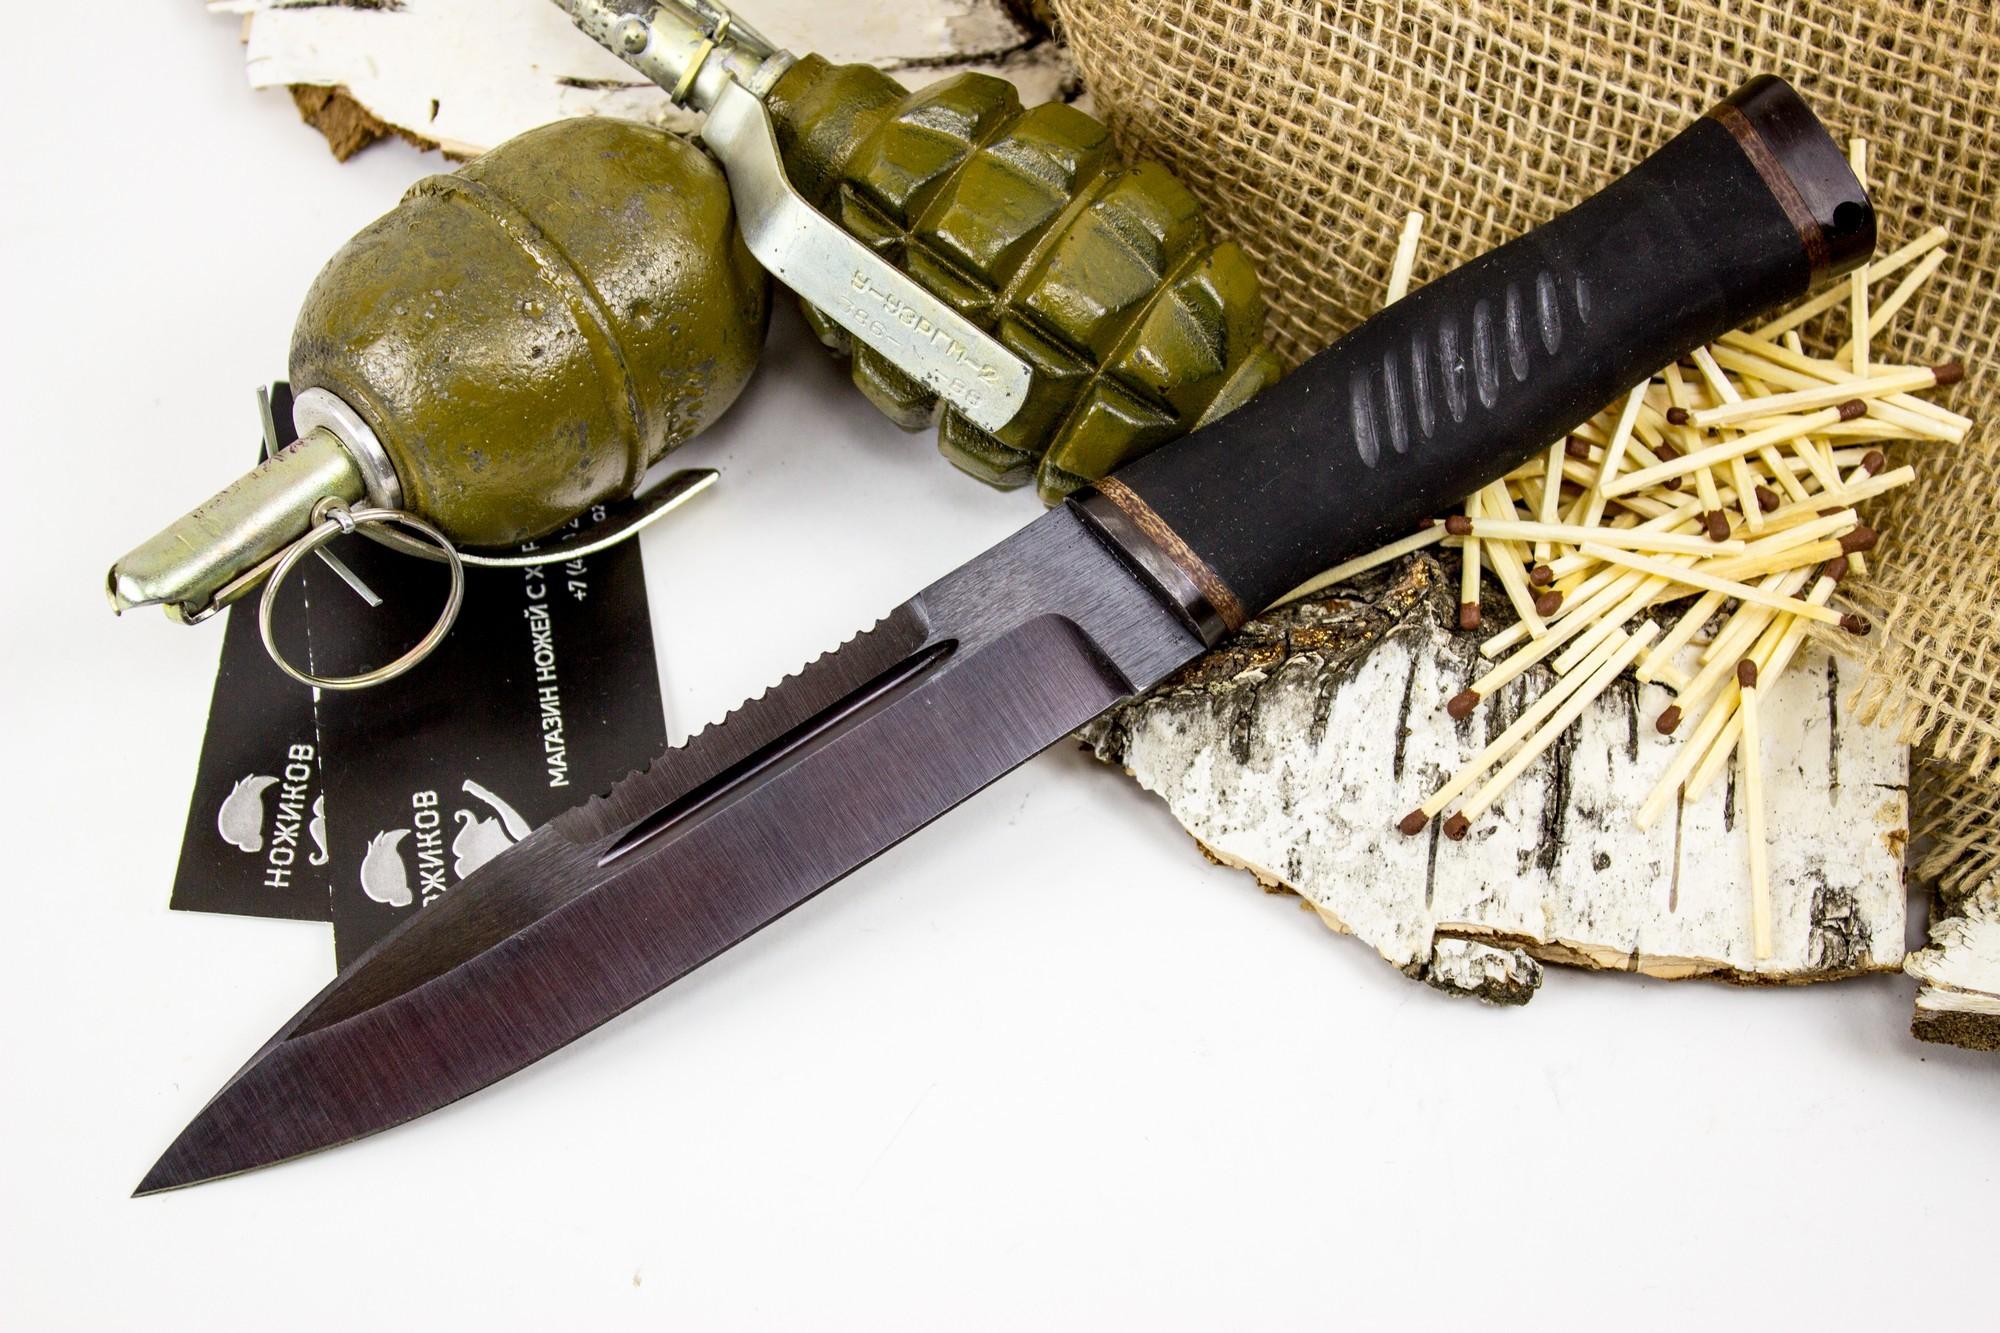 Нож Казак-2, сталь 65Г, резина